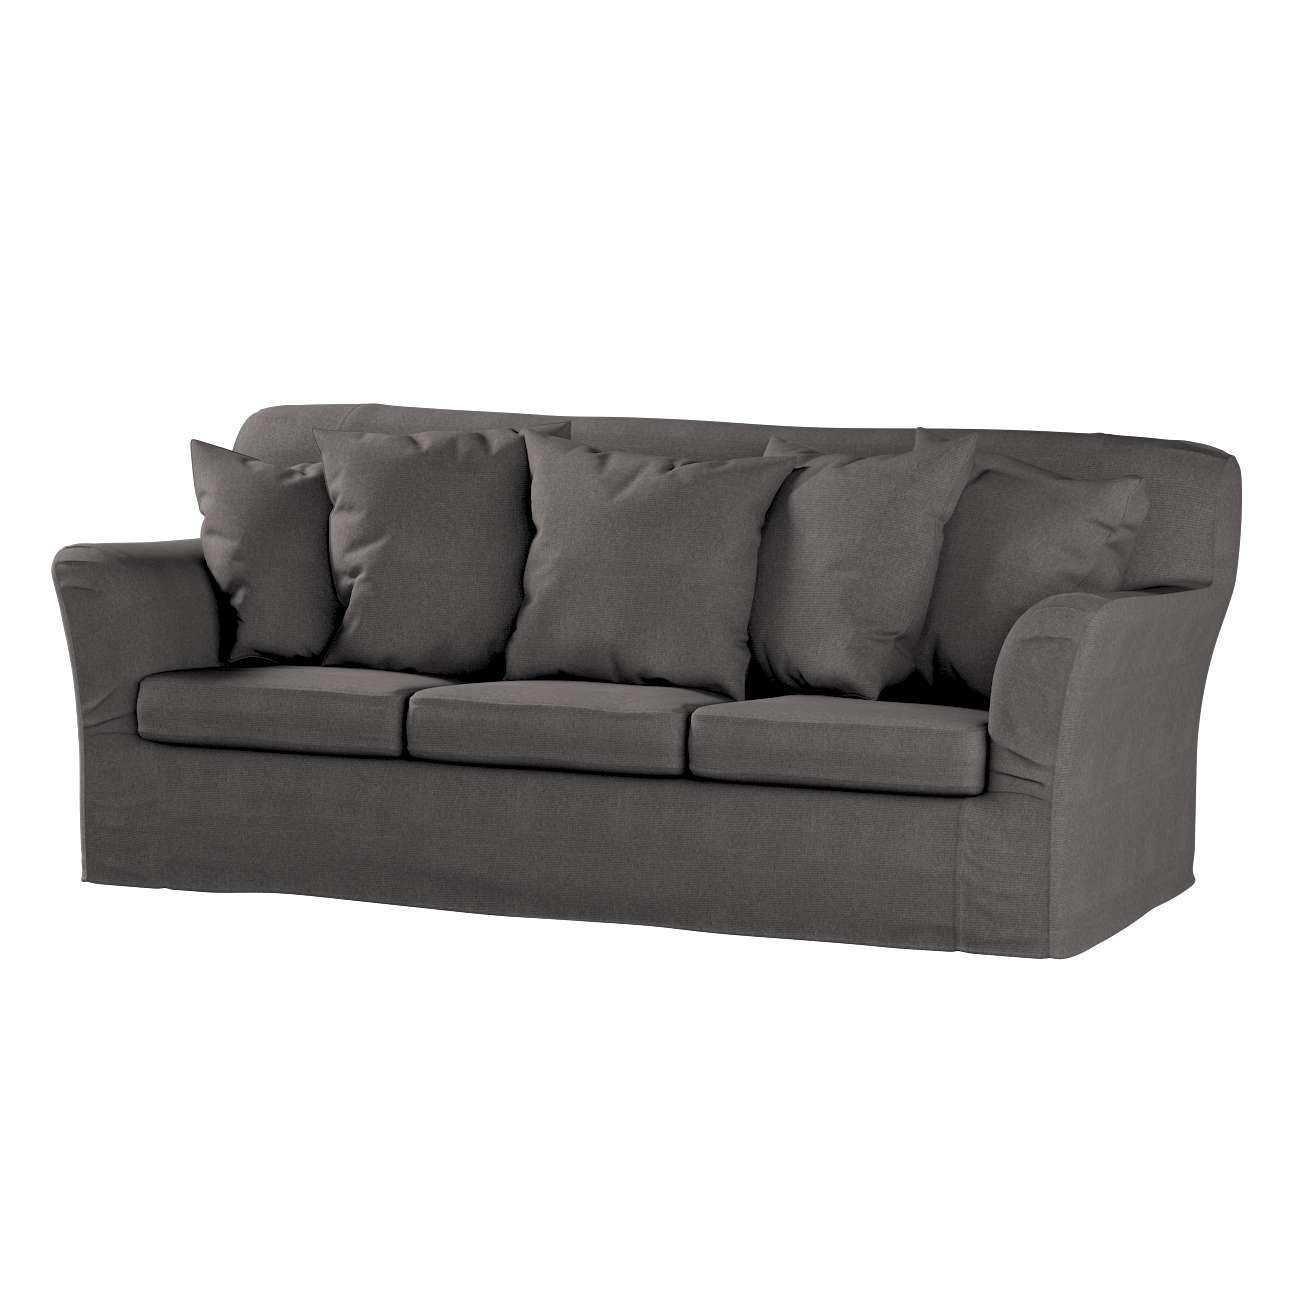 TOMELILLA  trivietės sofos užvalkalas TOMELILLA trivietė sofa kolekcijoje Etna , audinys: 705-35